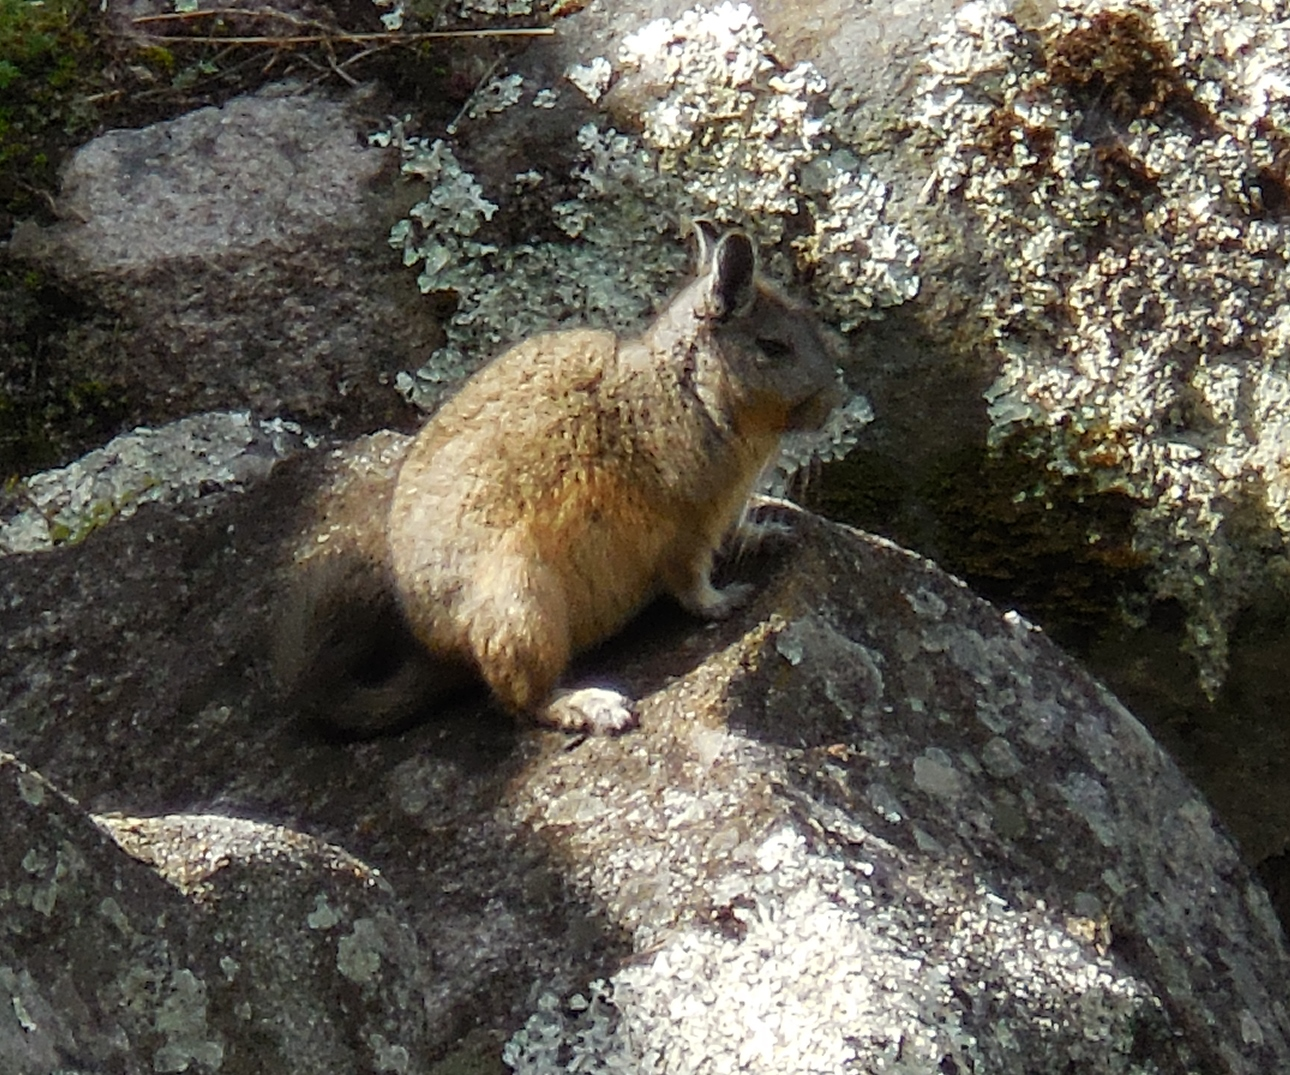 Machu Picchu arboreal chinchilla rat, (Cuscomys oblativa)